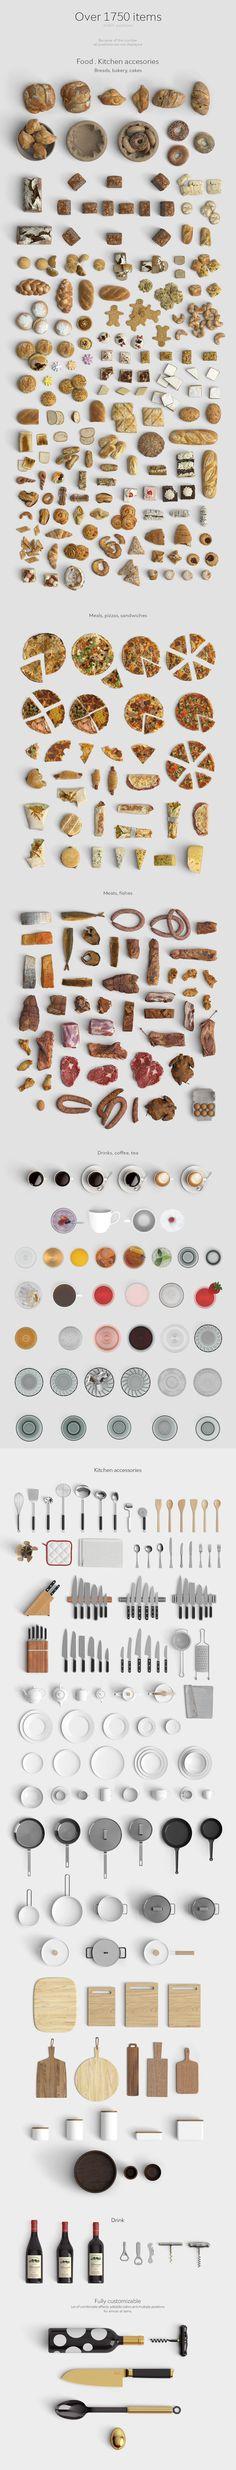 Scene creator [Top view] by Qeaql on Creative Market - Modern Web Design, Graphic Design, Scene Creator, The Creator, Hd Textures, Interior Plants, Interior Design, Mockup Templates, Branding